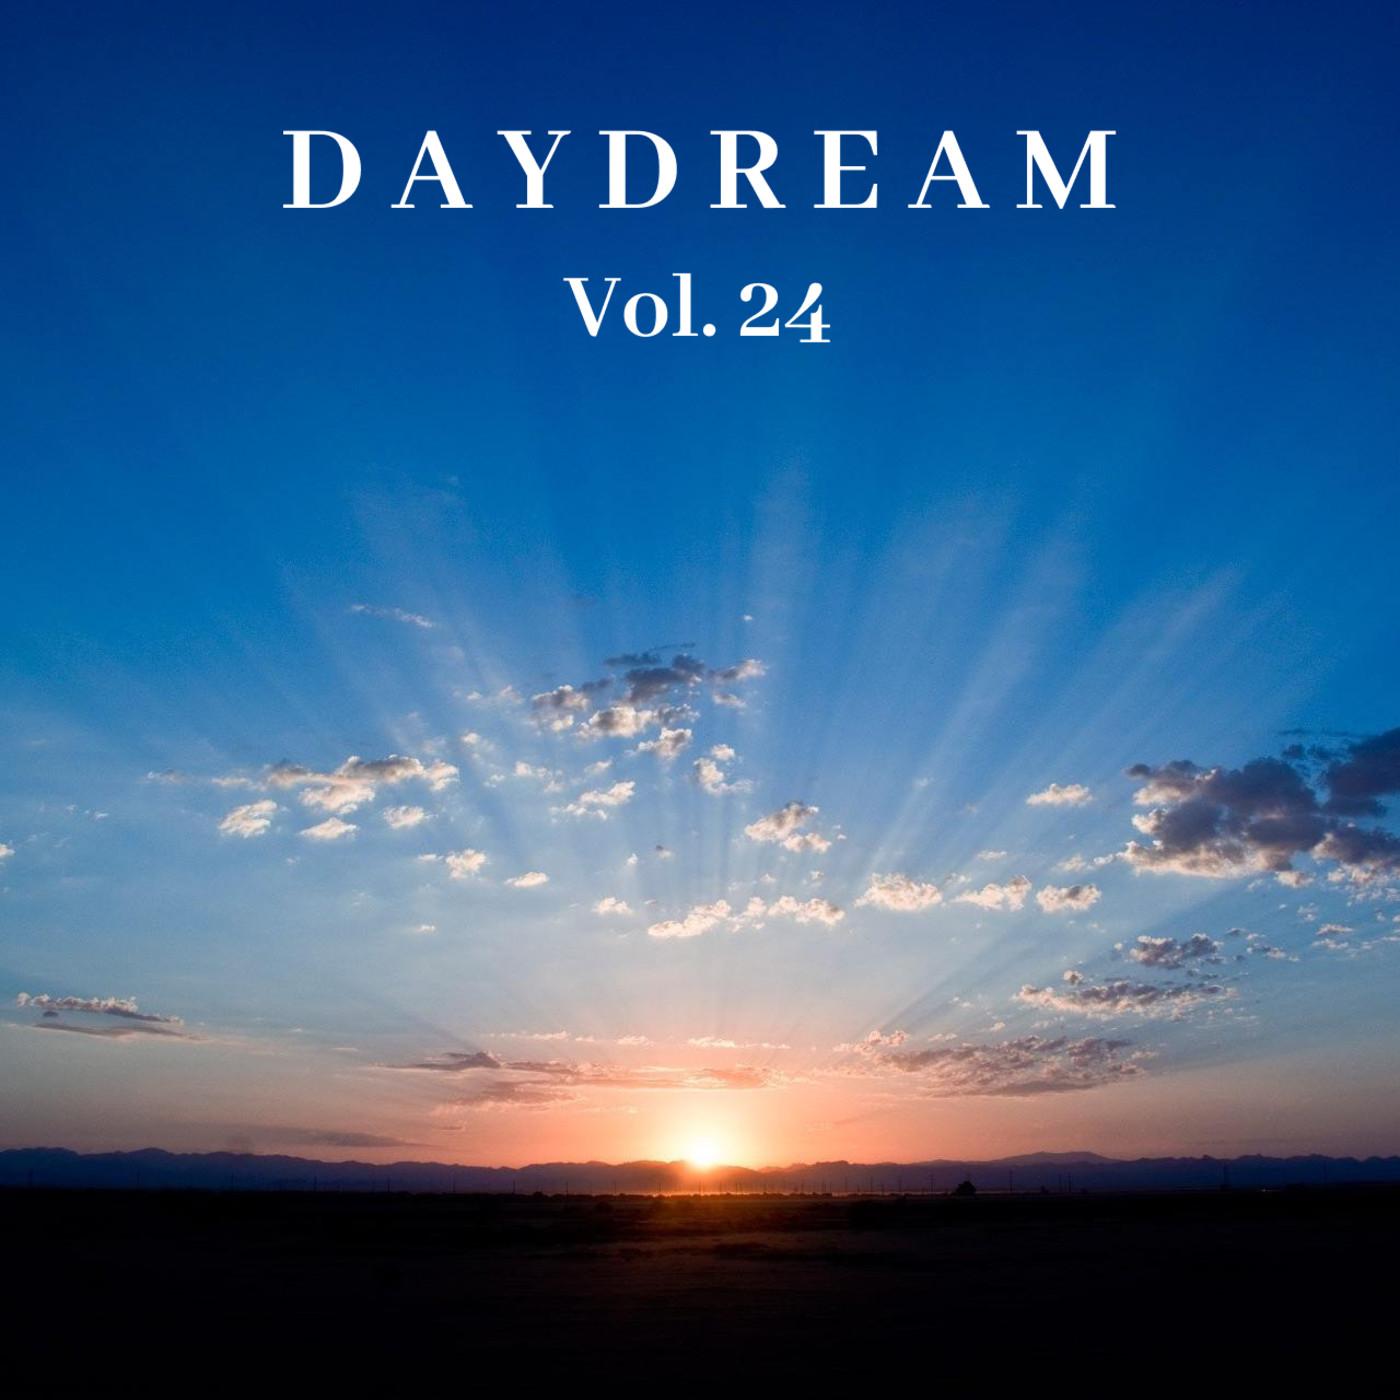 DayDream Vol. 24